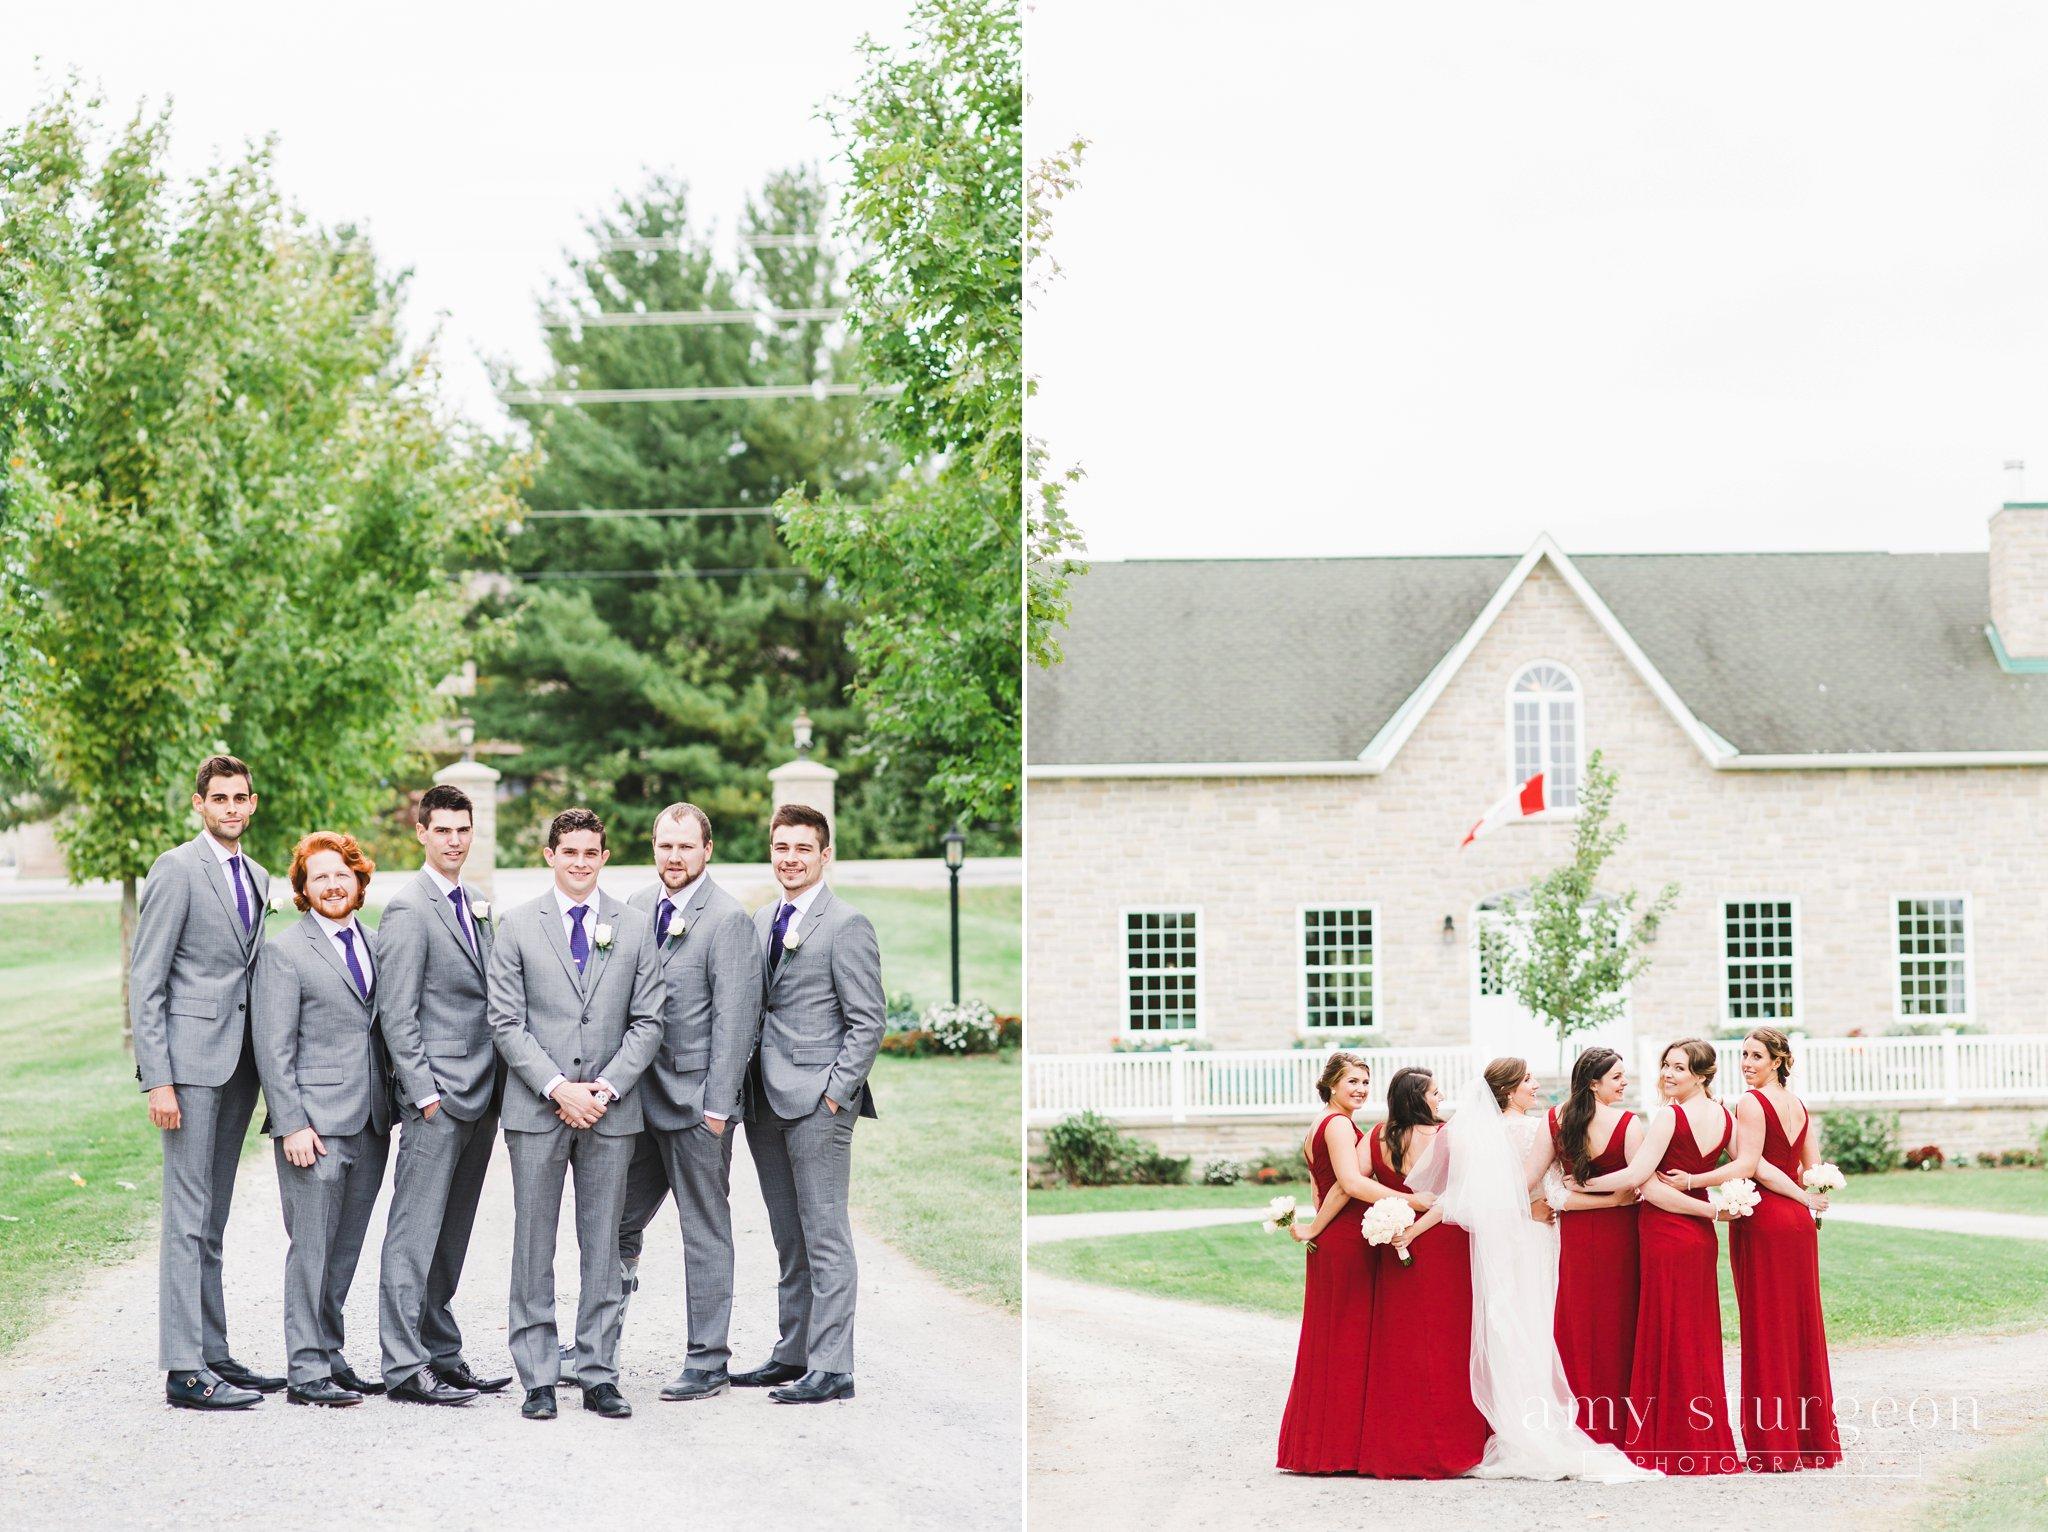 Red bridesmaids dresses from david's bridal at the alpaca farm wedding